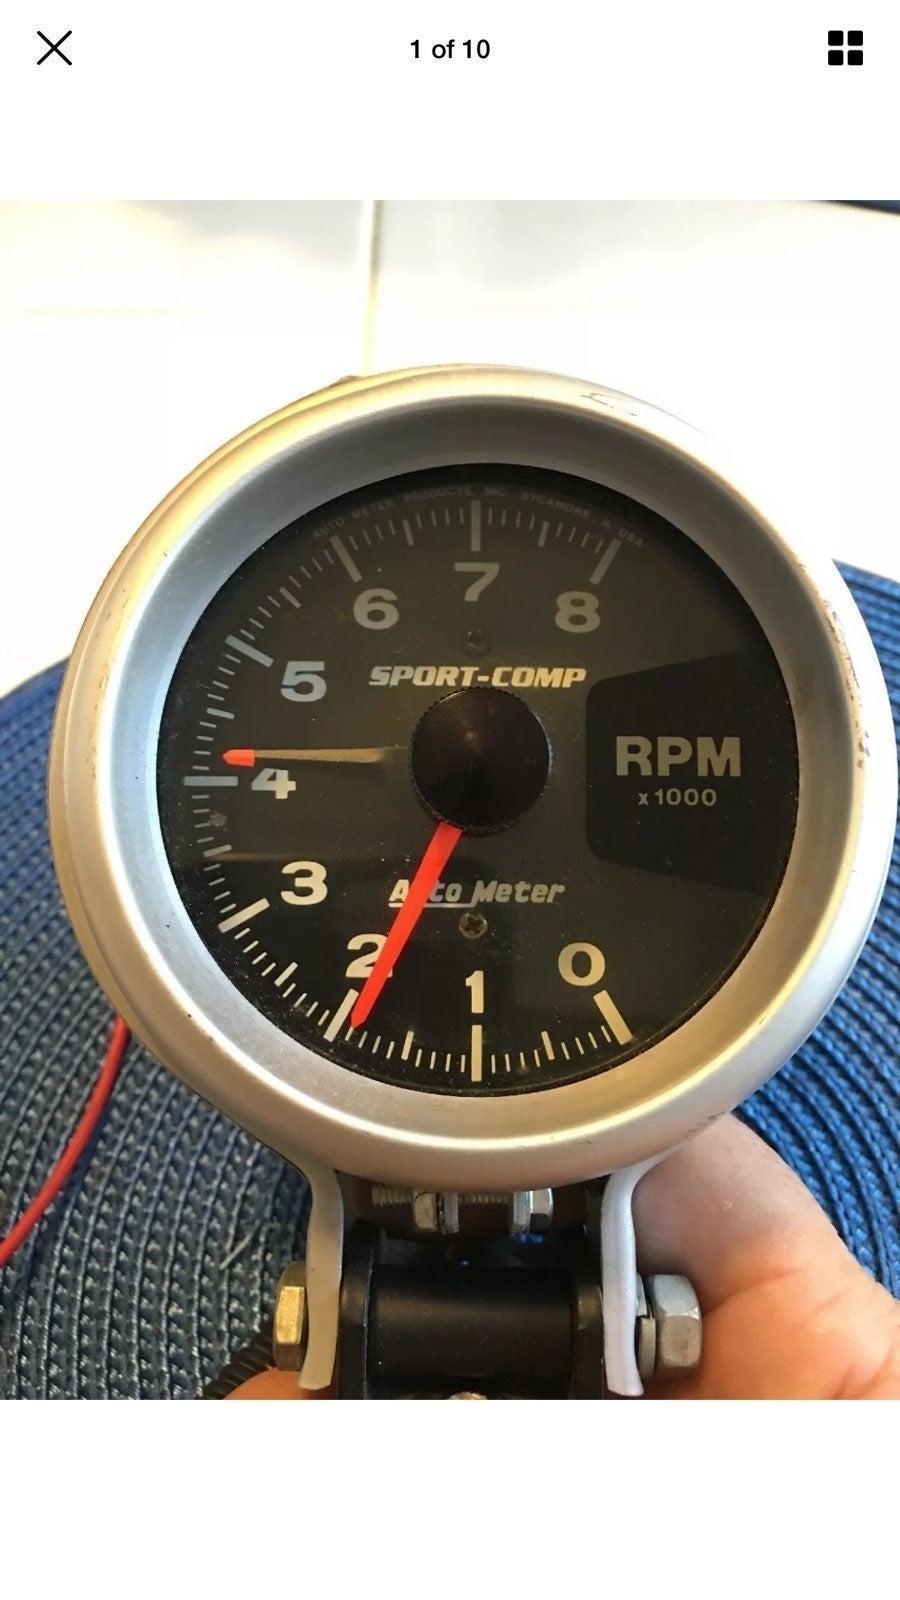 AutoMeter 3780 Sport-Comp Tachometer